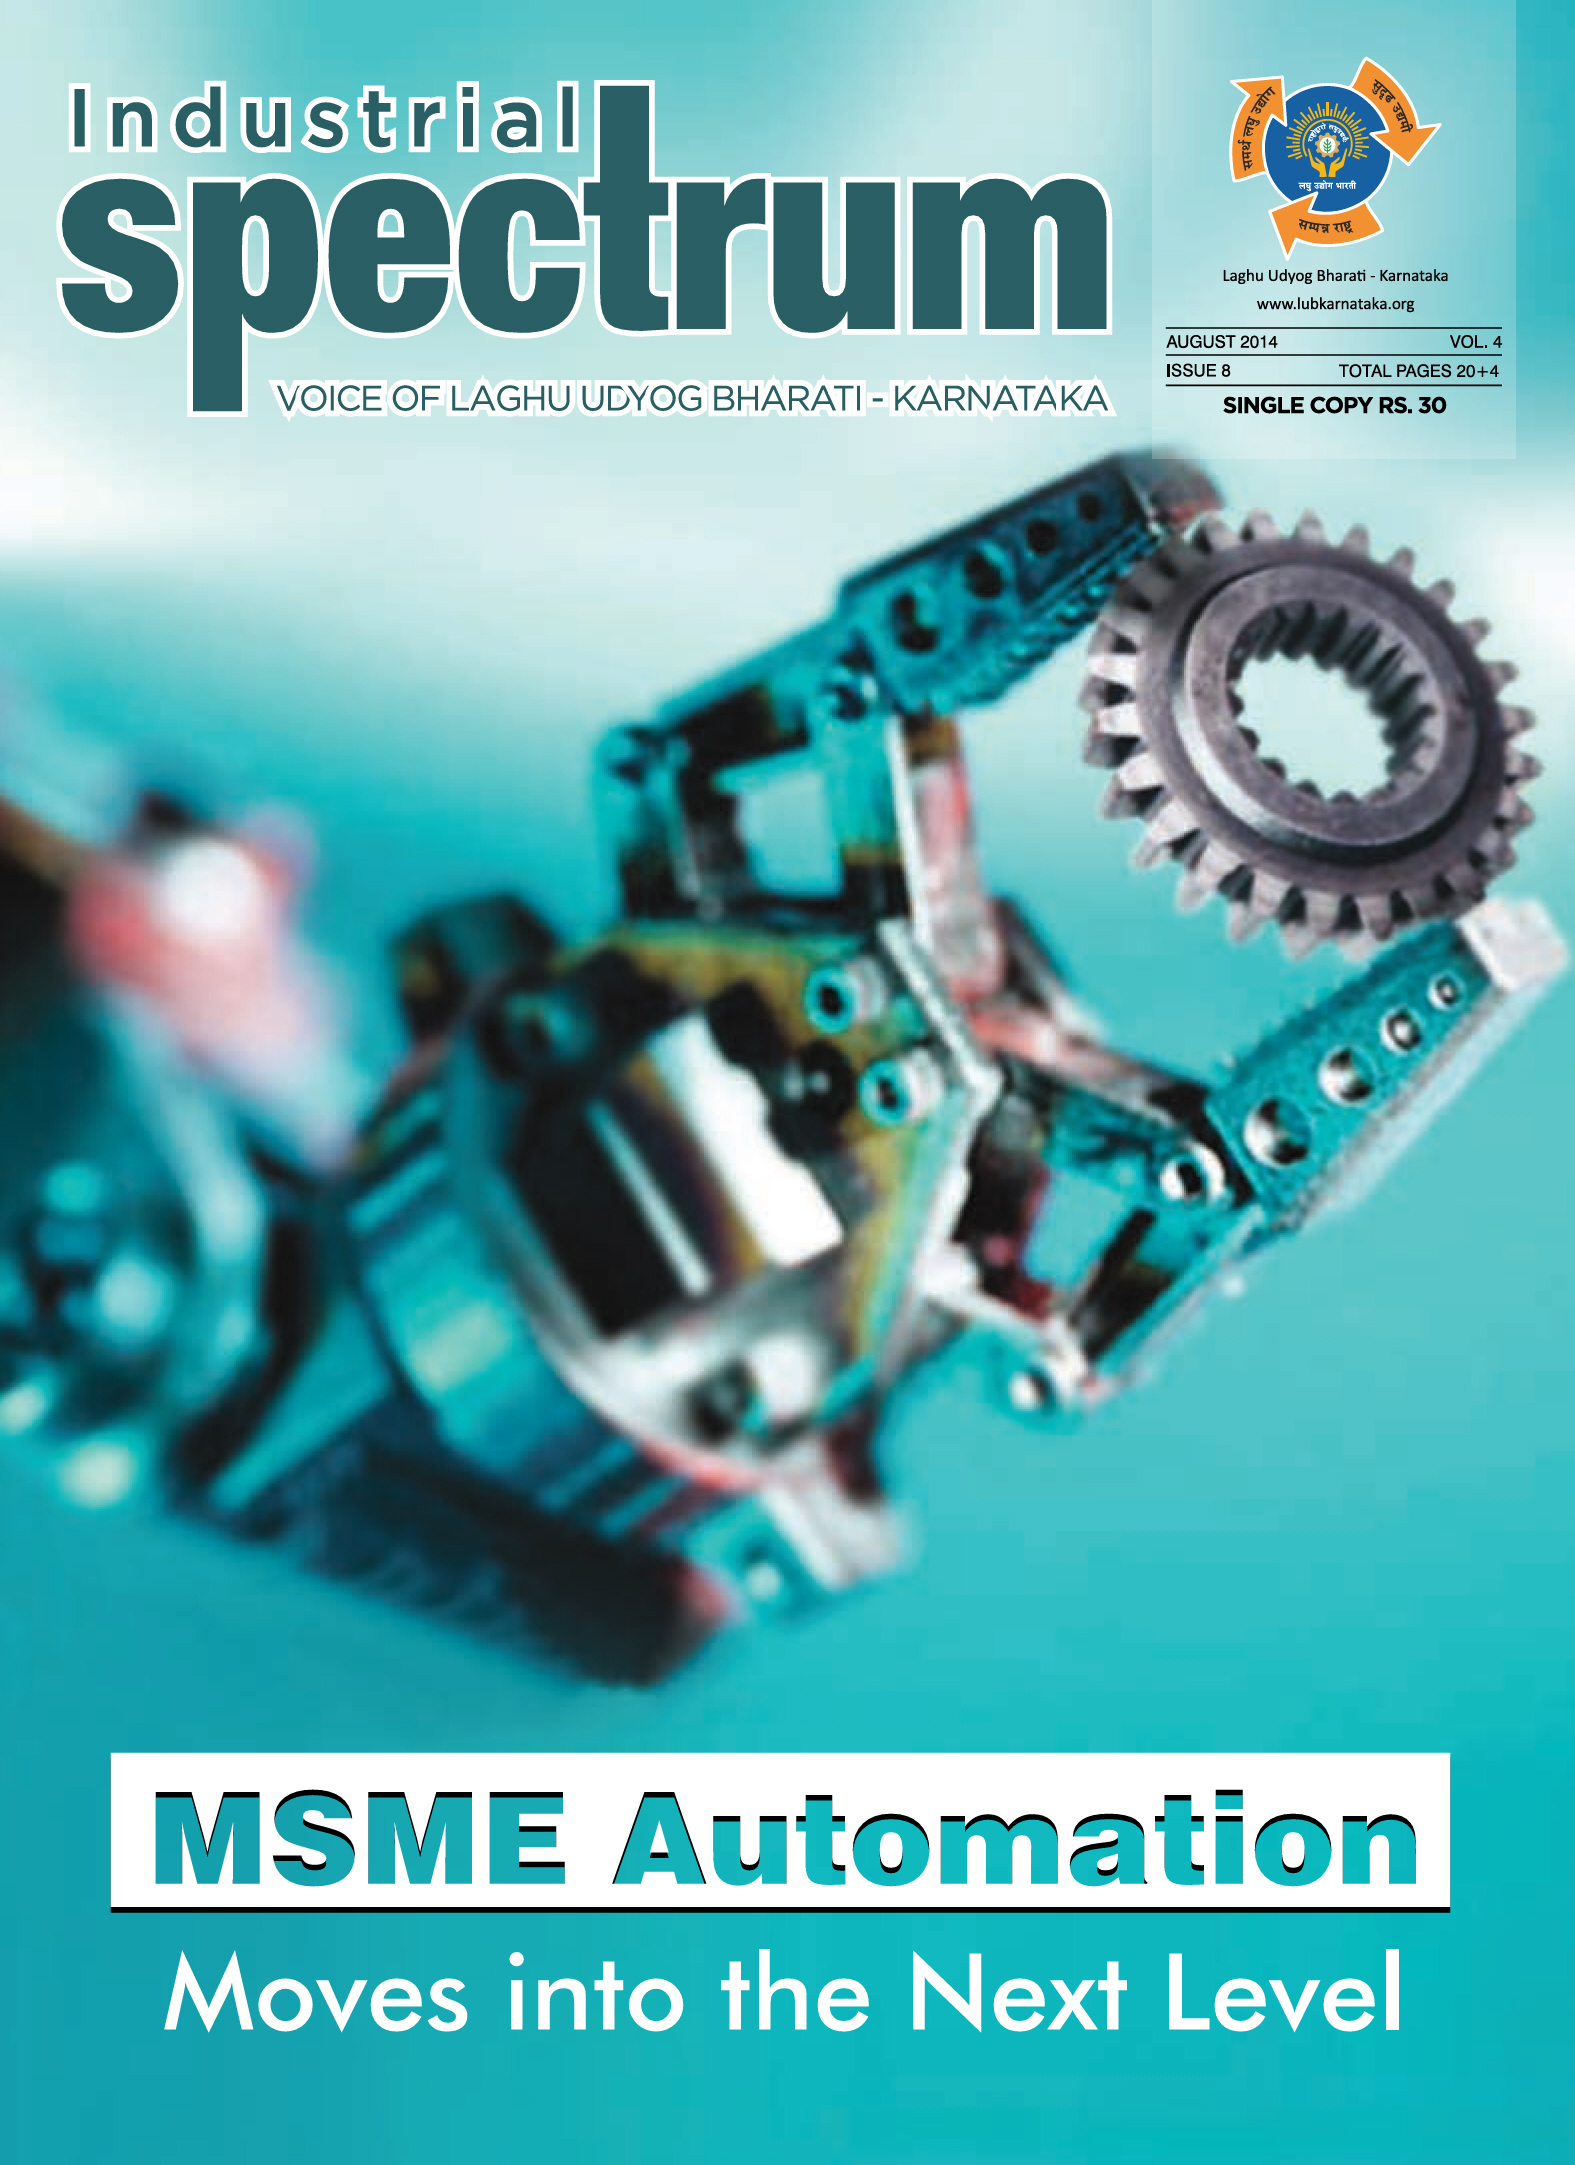 Industrial spectrum august edition   2014